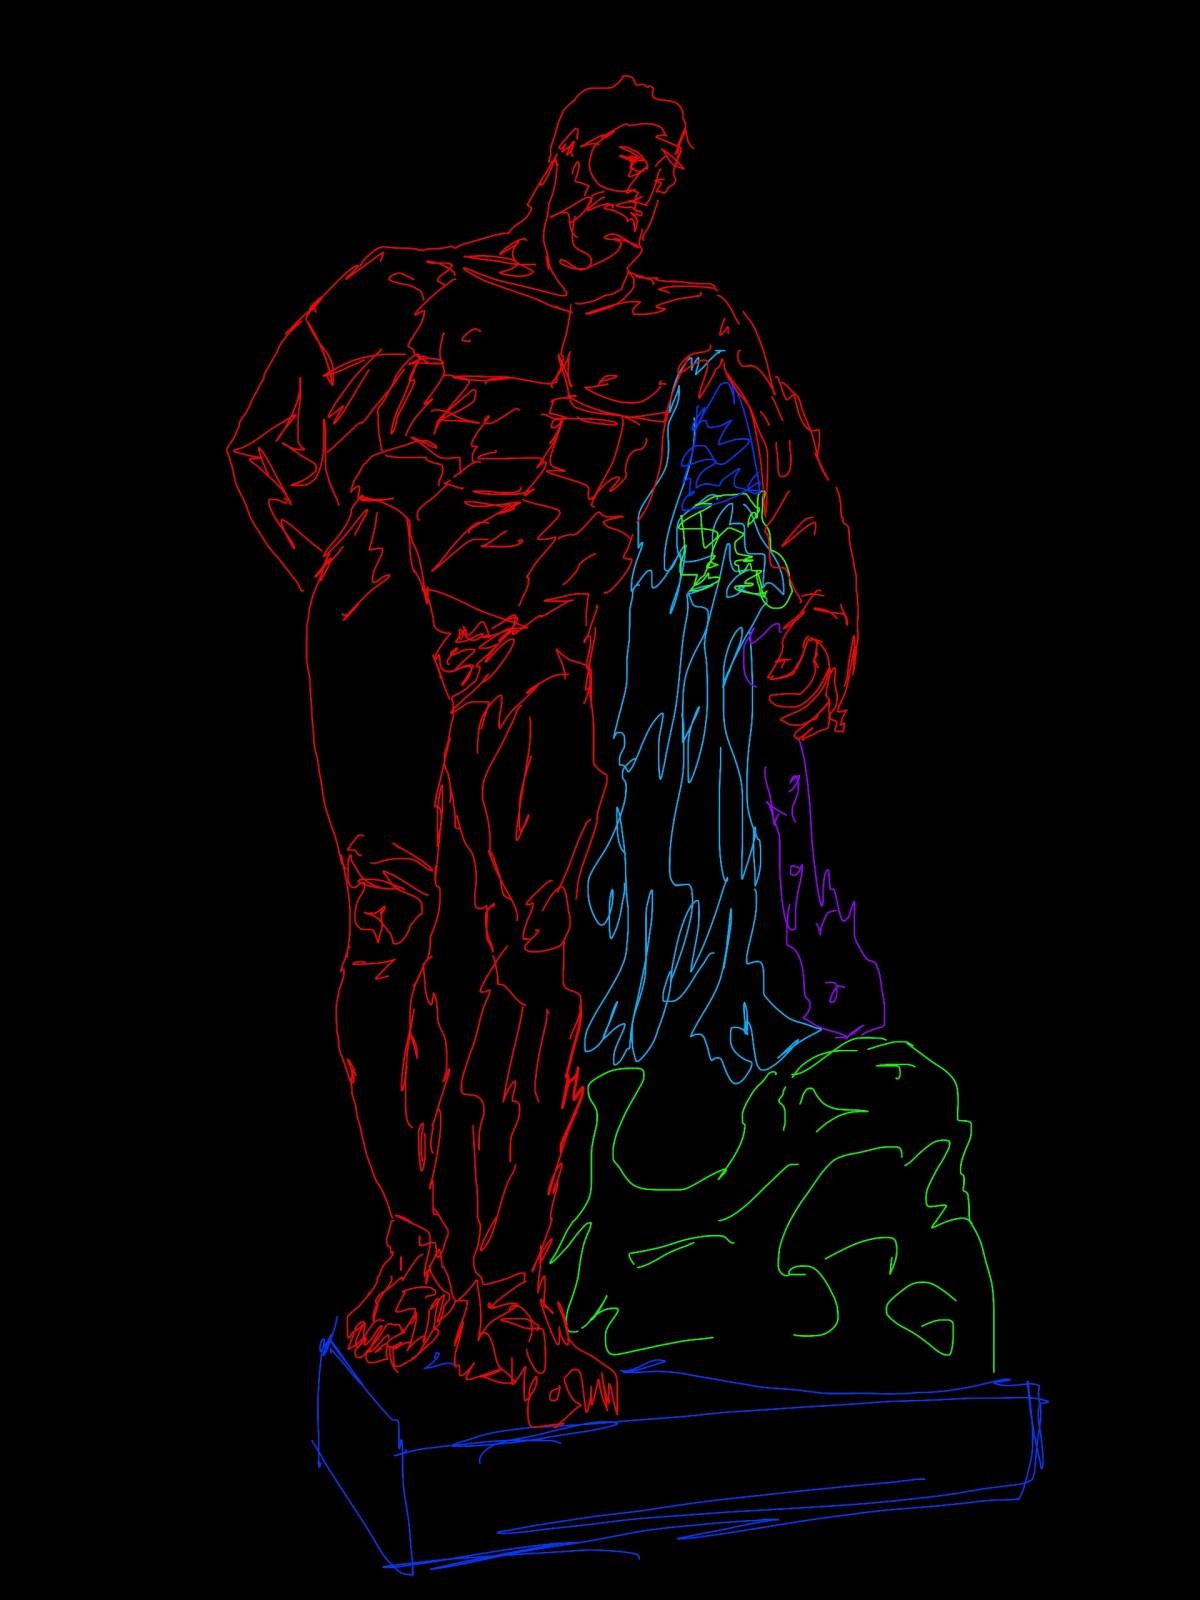 Hercules eric kim abstract